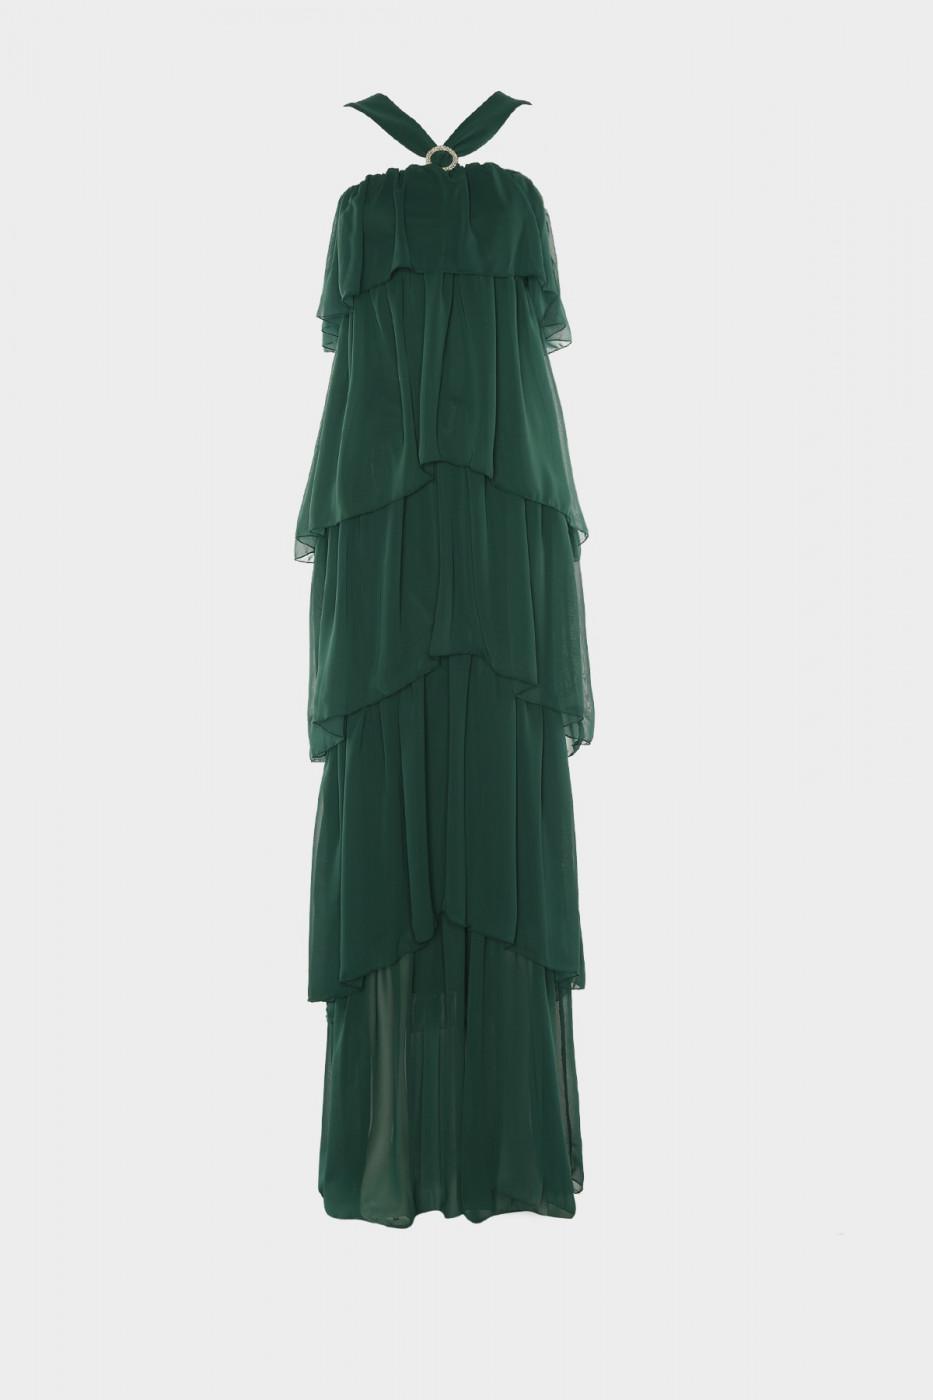 Trendyol Emerald Green Stone Buckle Detailed Evening Dress & Graduation Dress